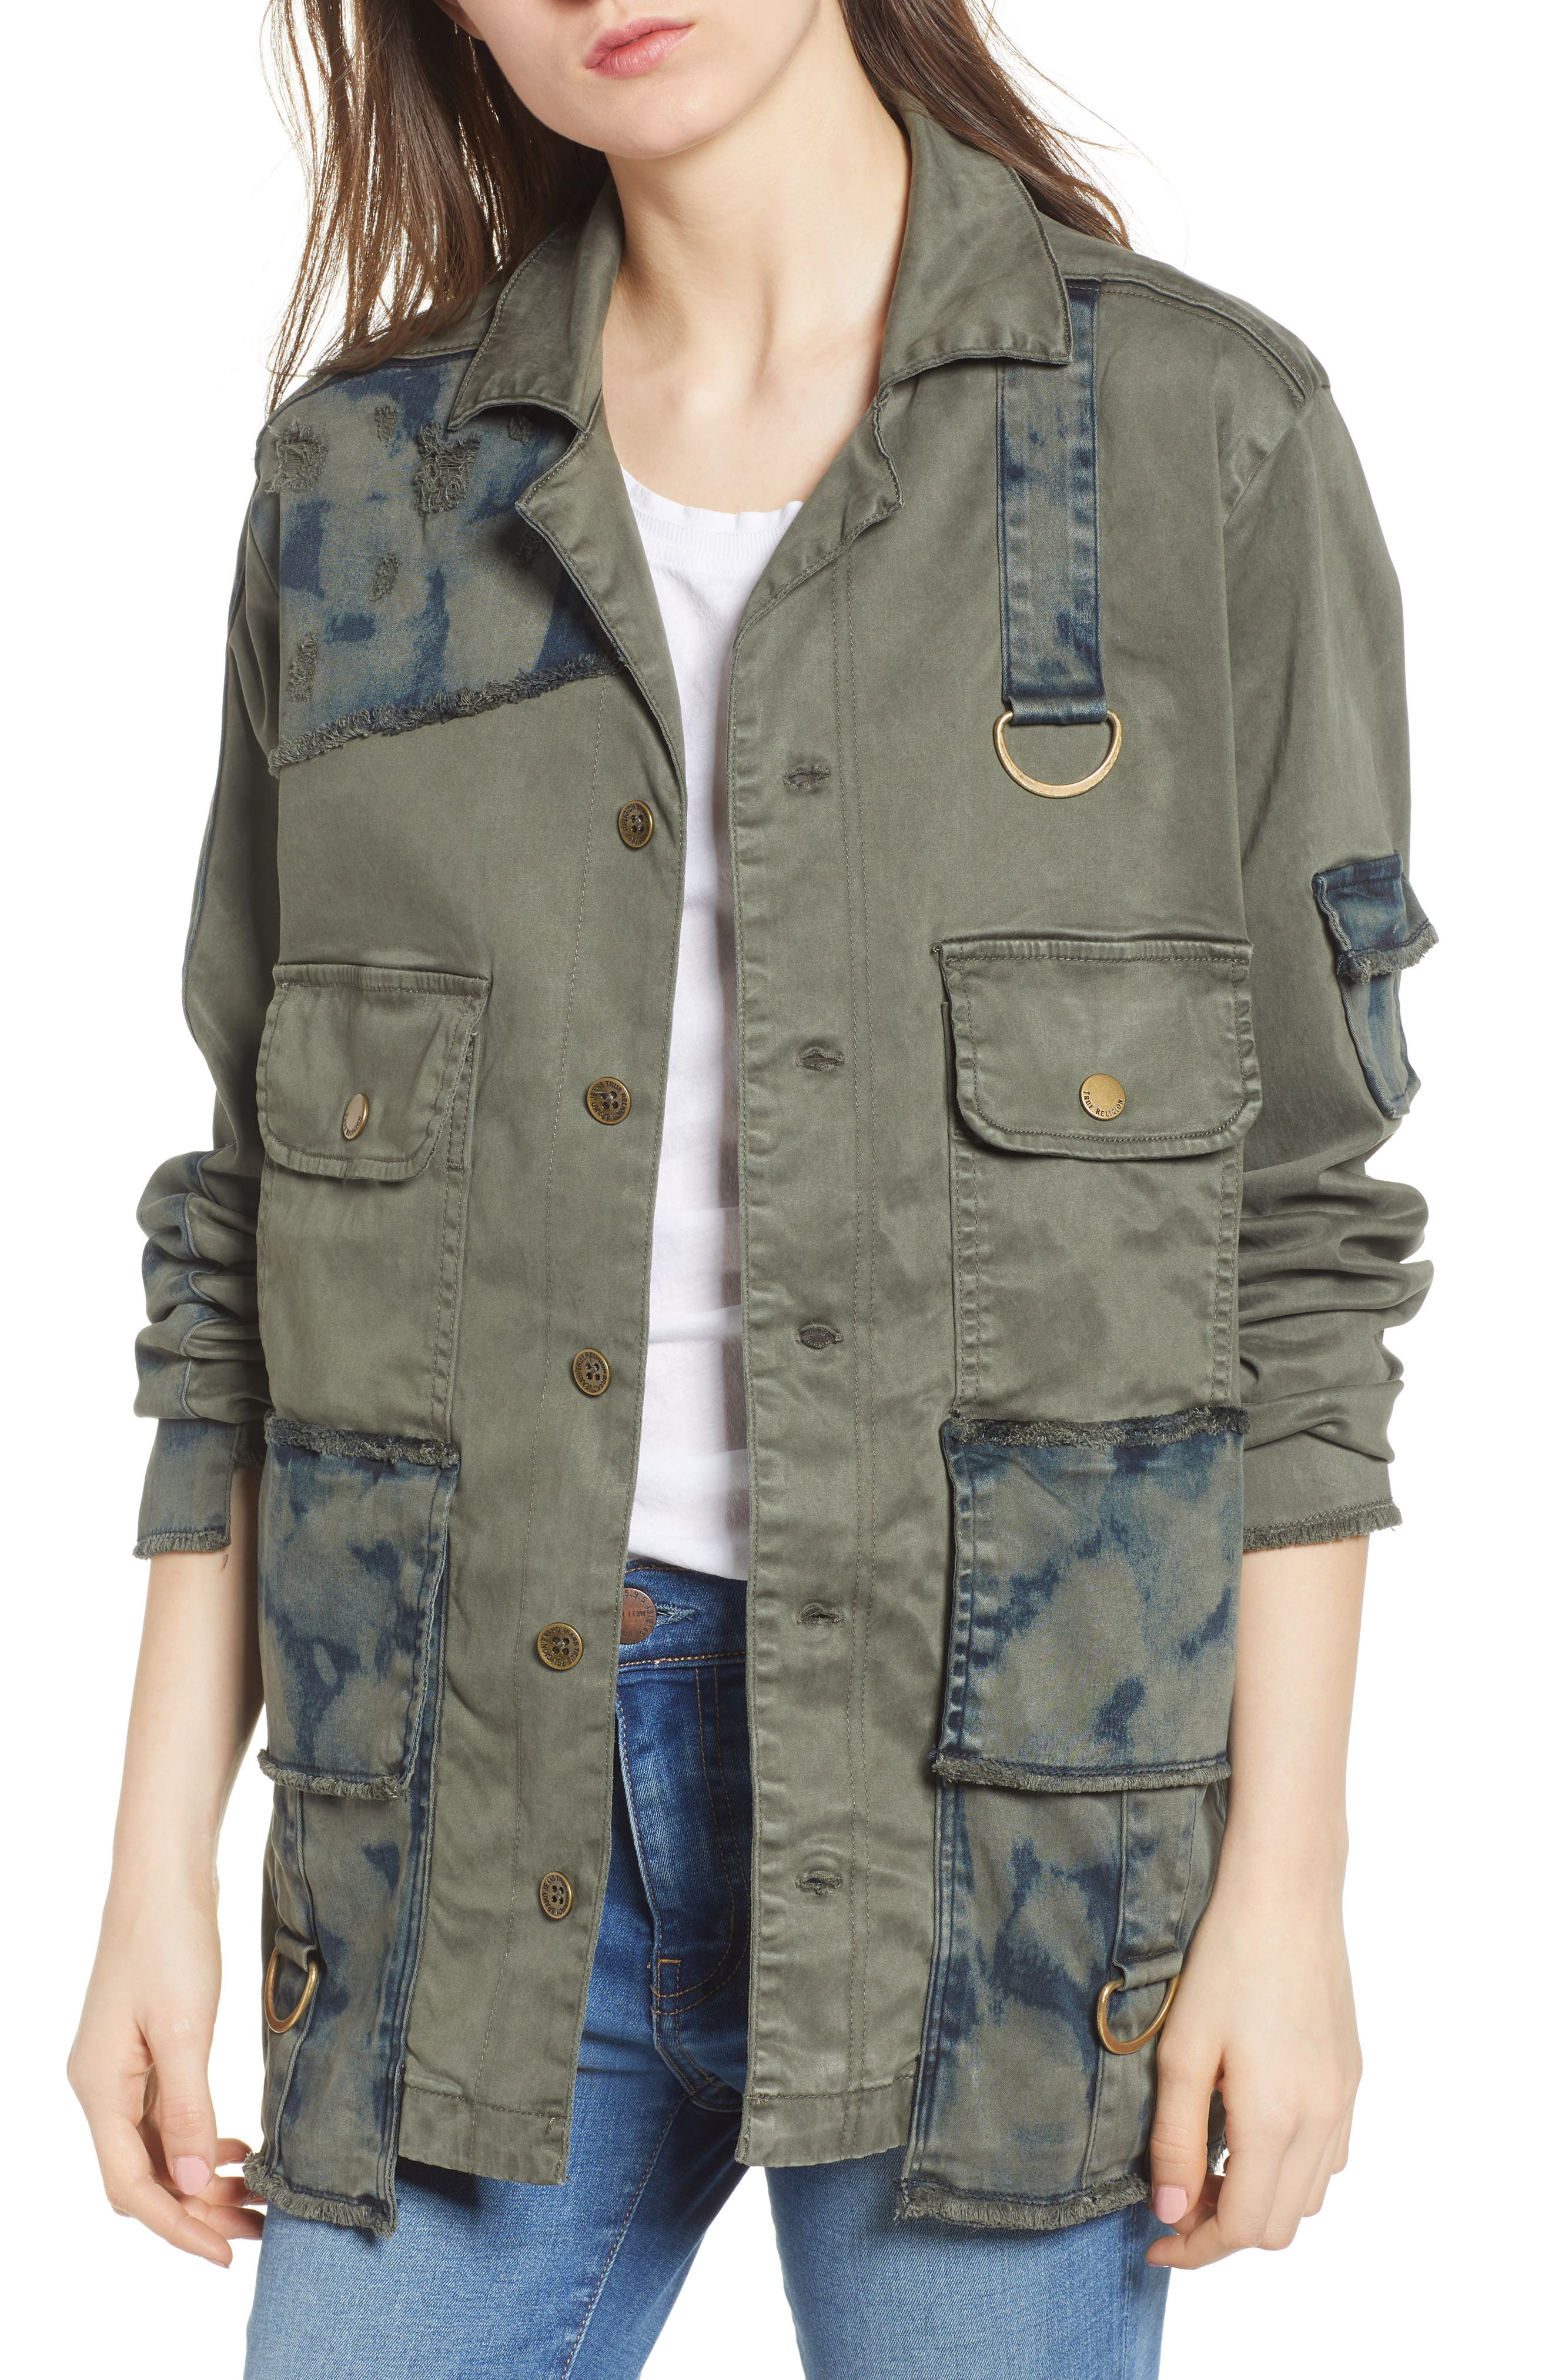 True Religion Brand Jeans Military Jacket